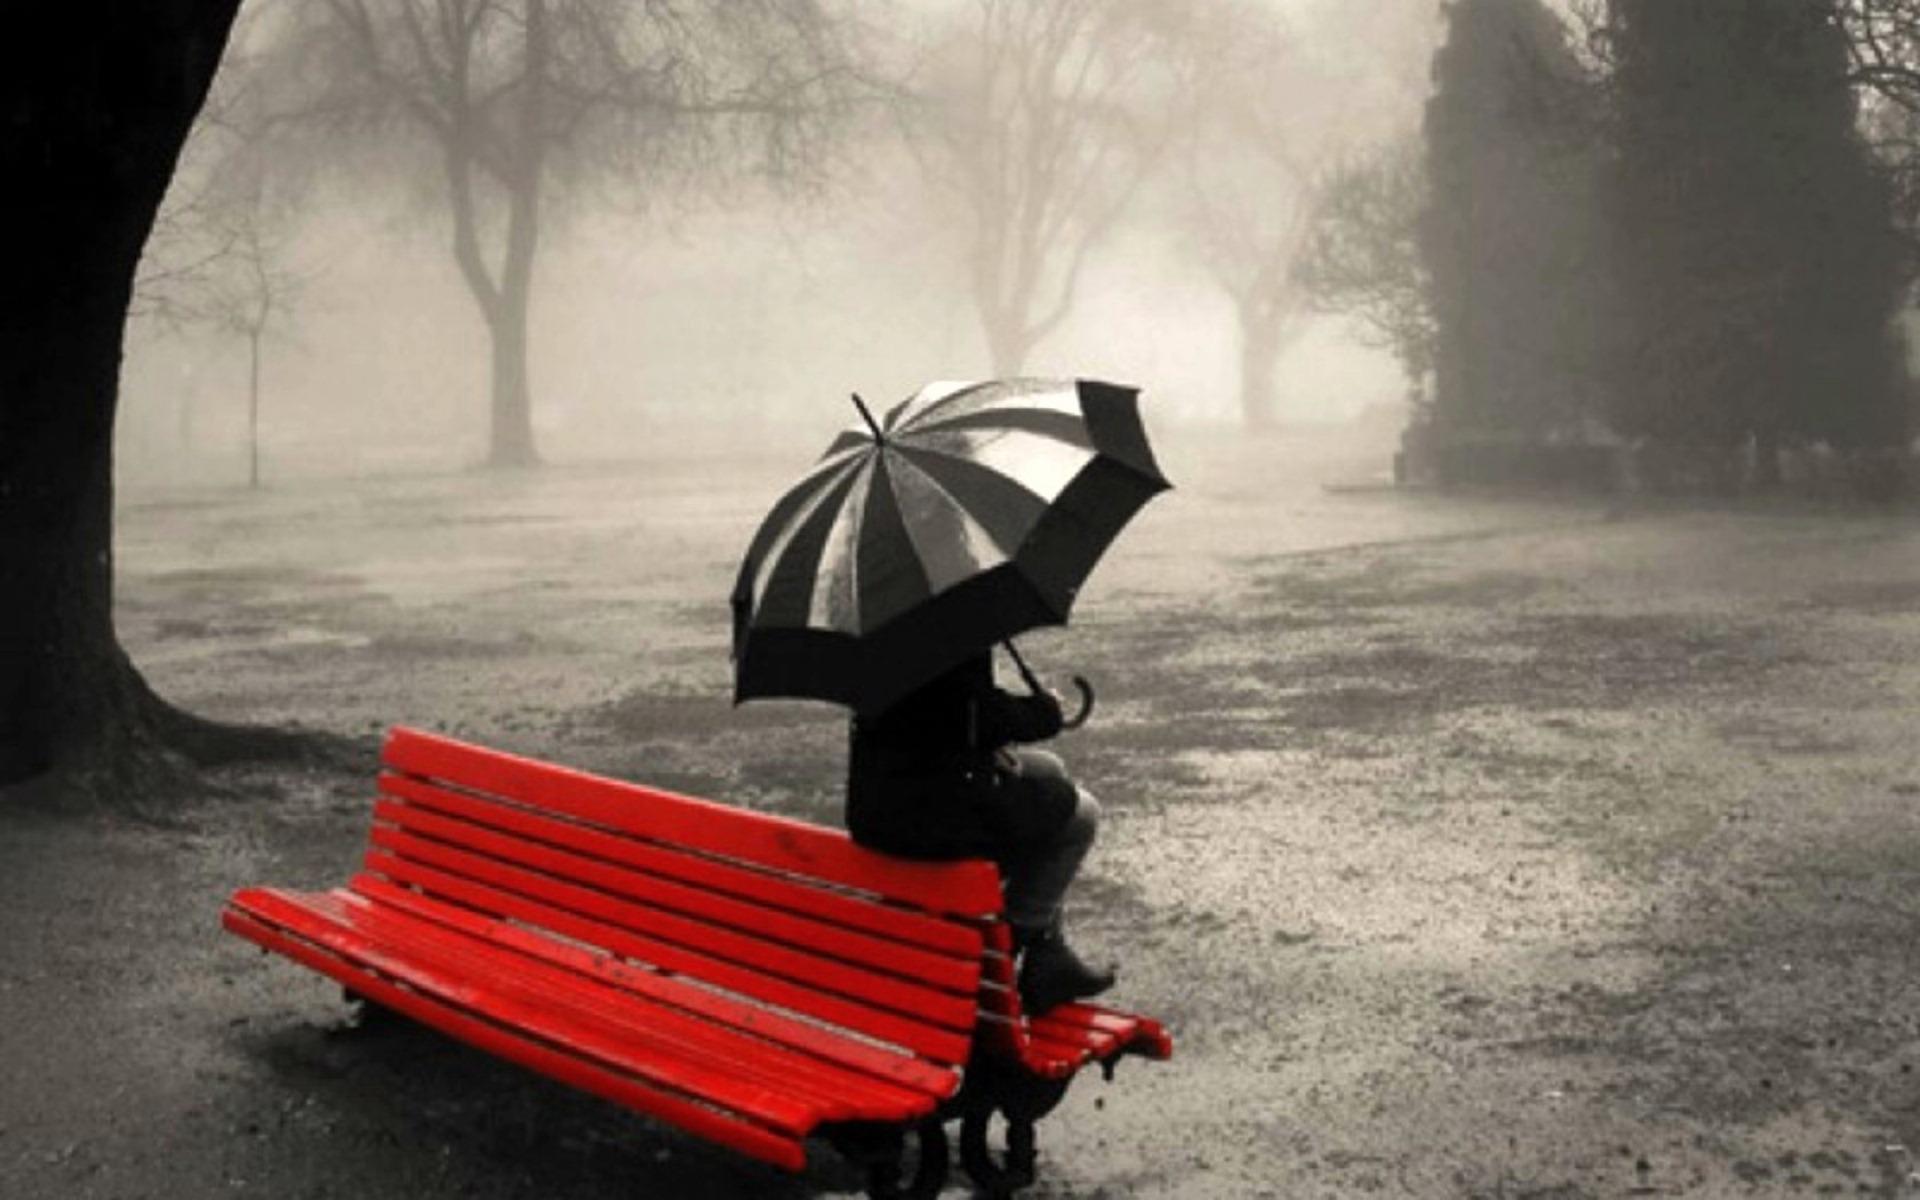 sad rainy movie scene - HD1920×1200